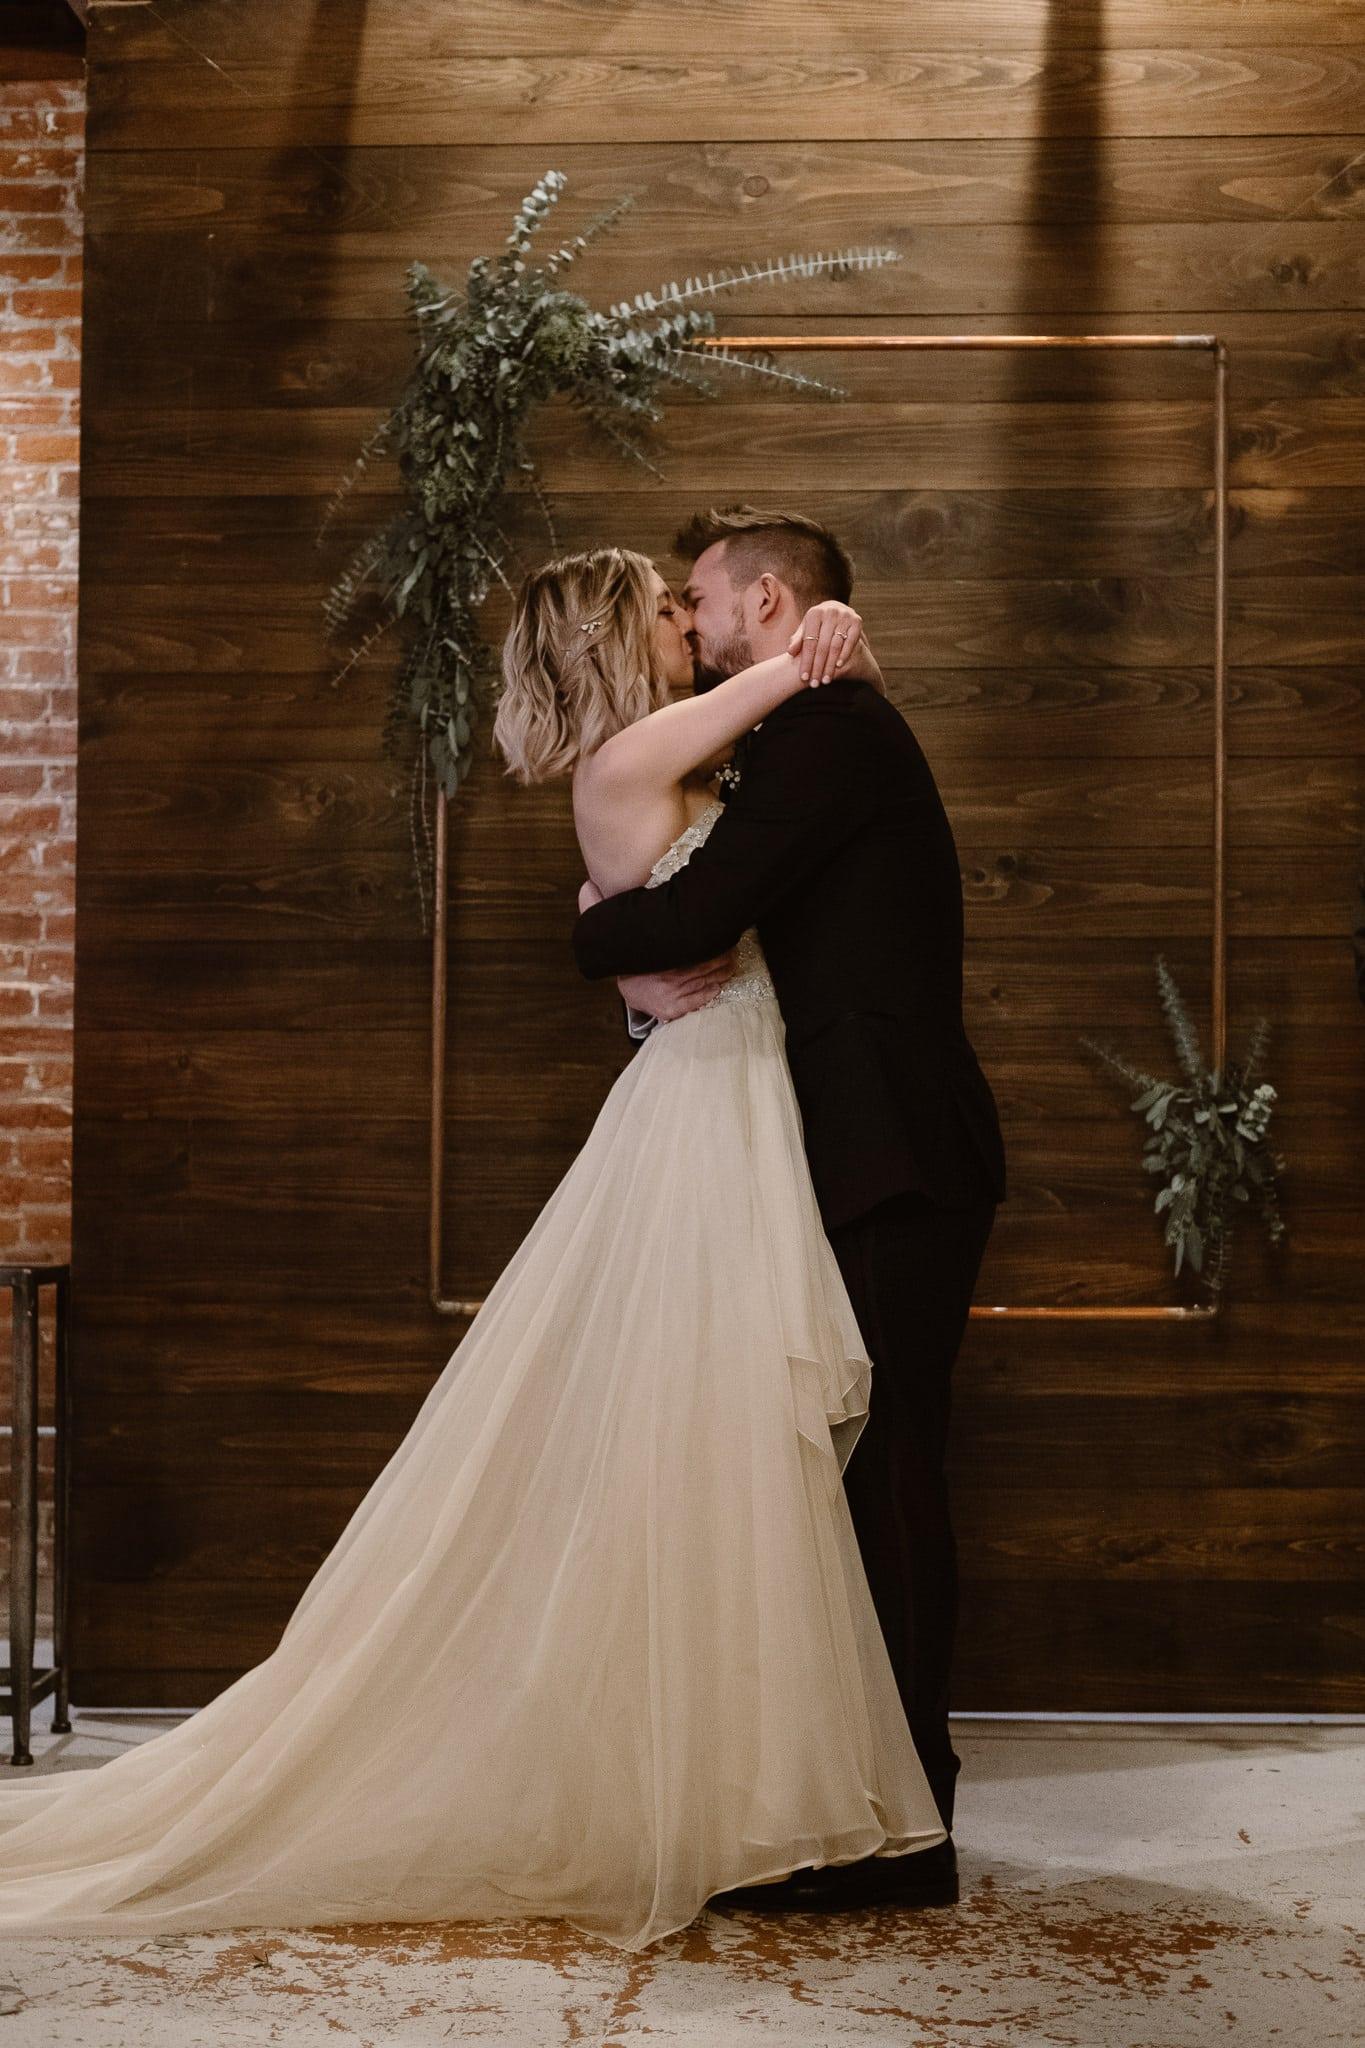 St Vrain Wedding Photographer   Longmont Wedding Photographer   Colorado Winter Wedding Photographer, Colorado industrial chic wedding ceremony, first kiss